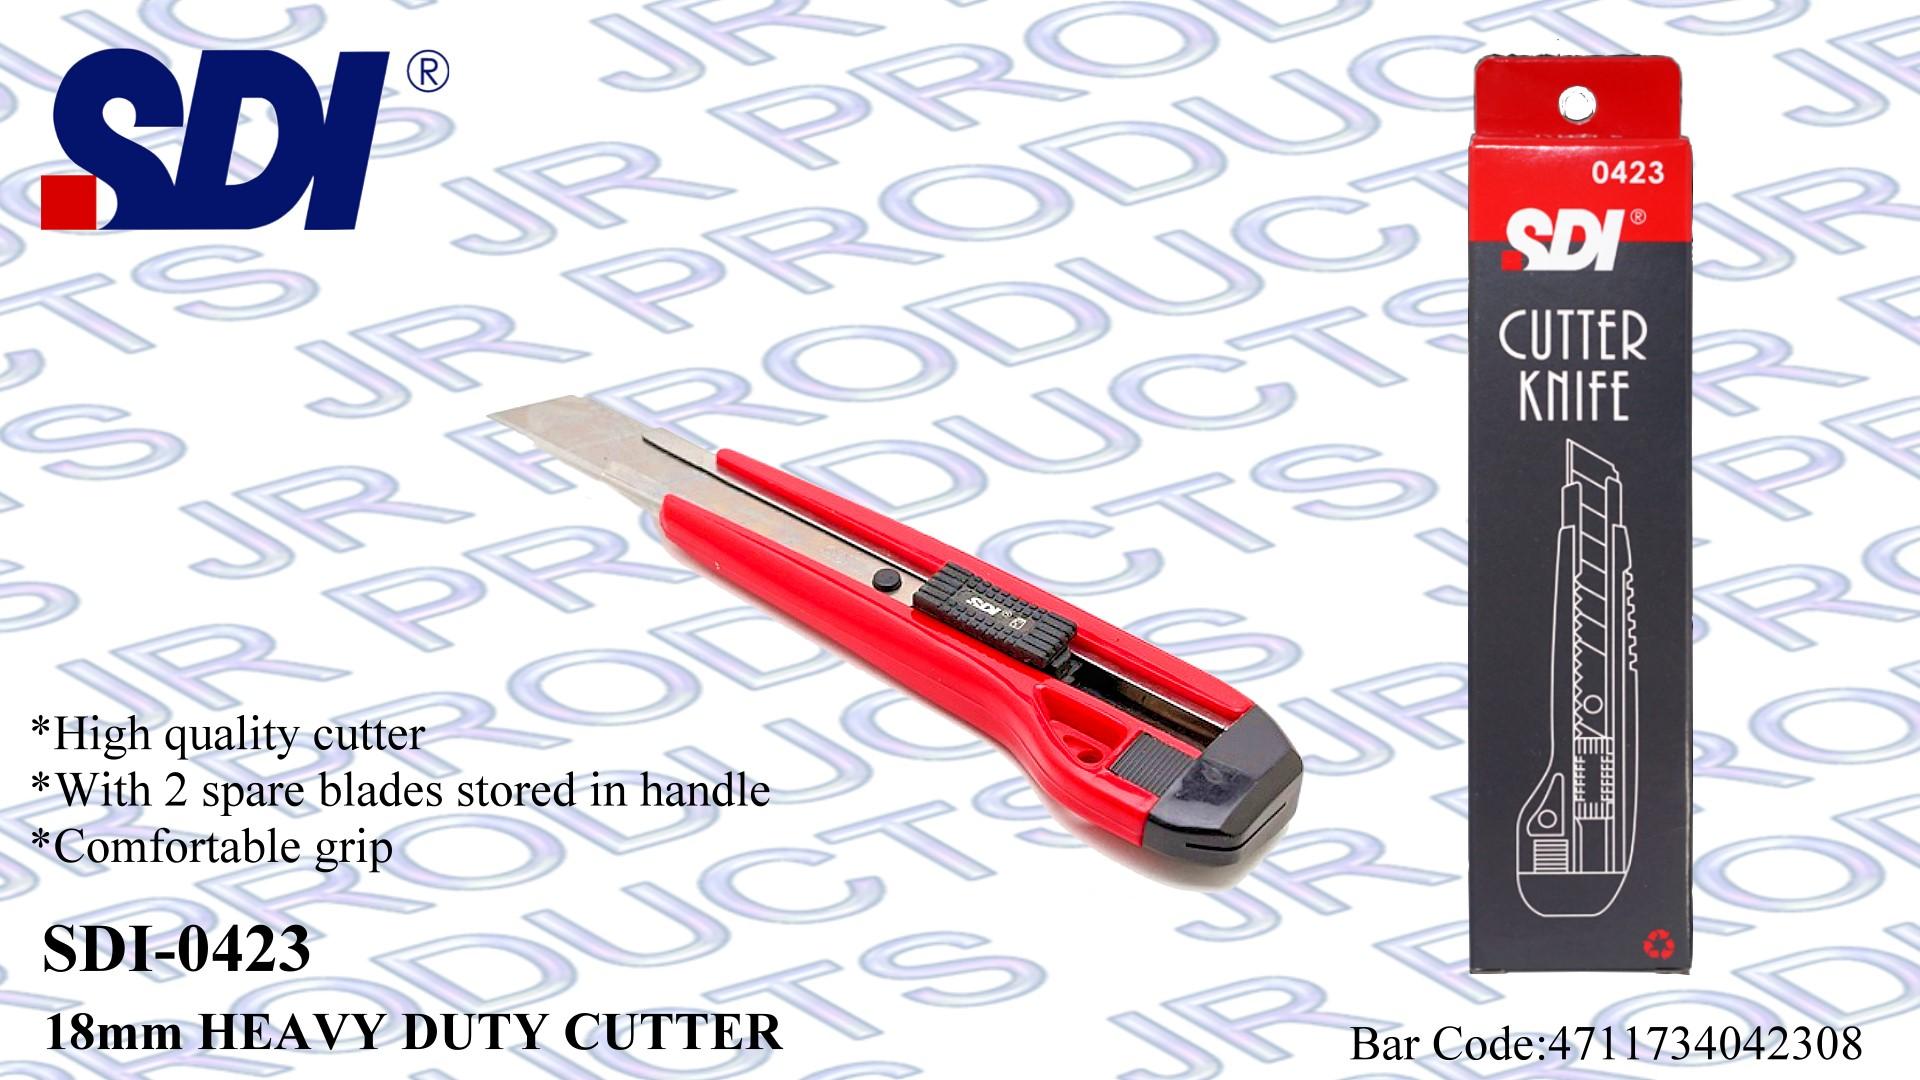 Jim-Ray Trading Co. 展毅貿易公司 | SDI 18mm 大界刀